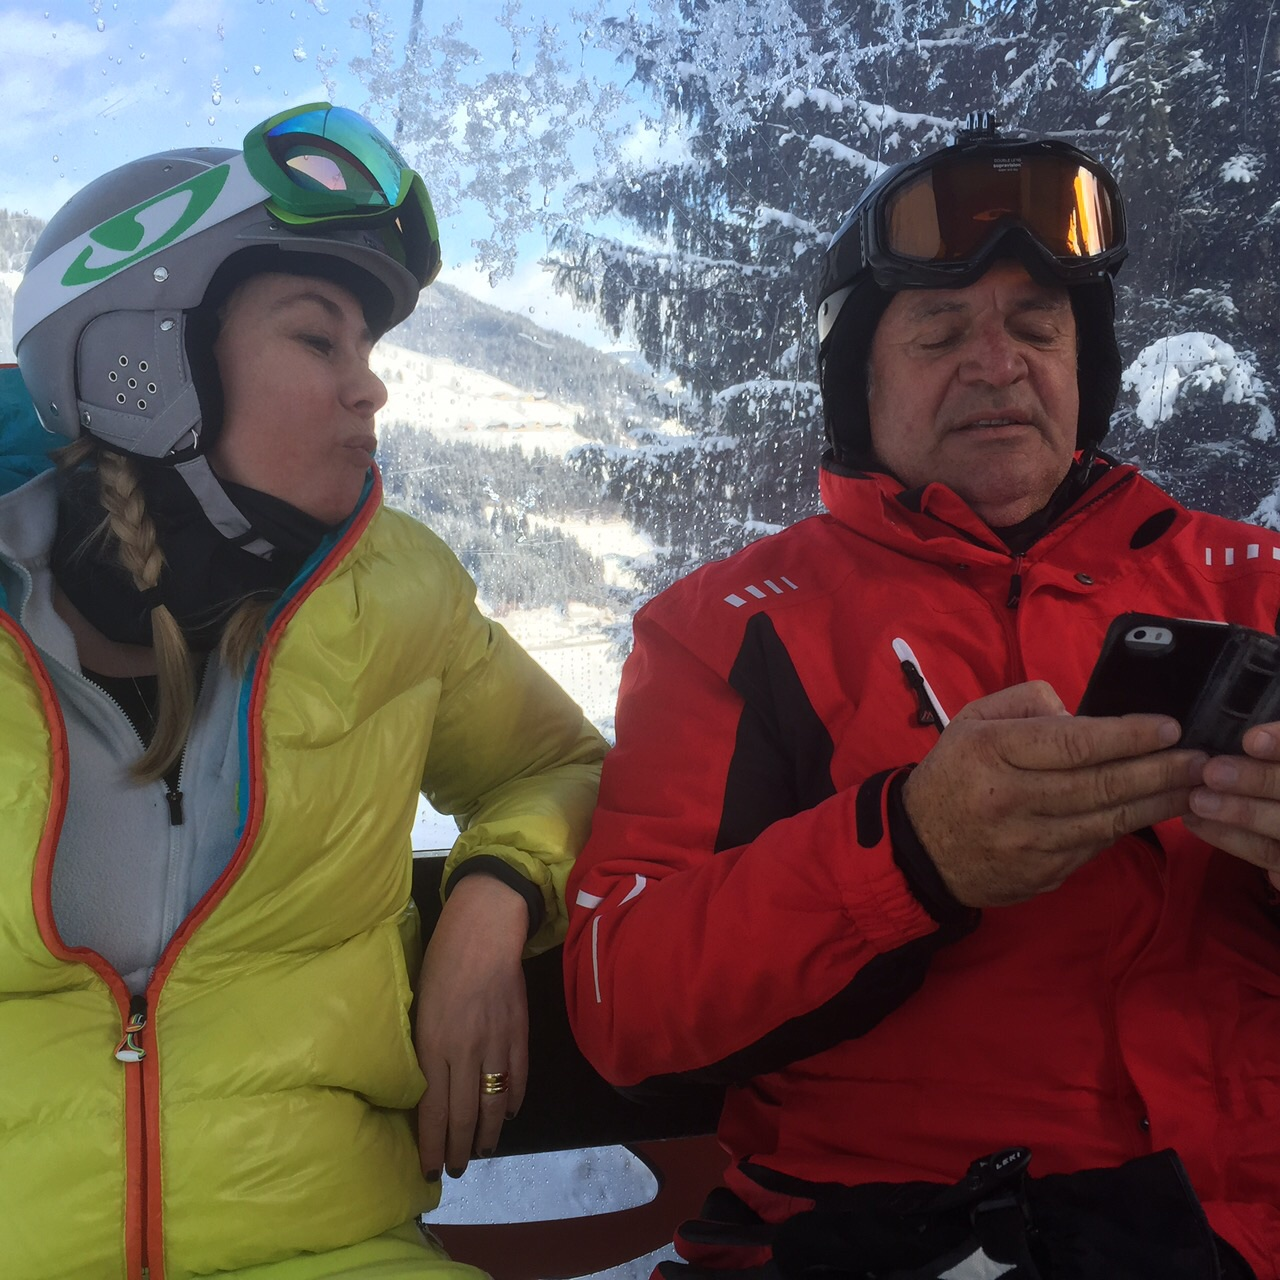 Me and our friend Keith, Flachau Ski Area 2016